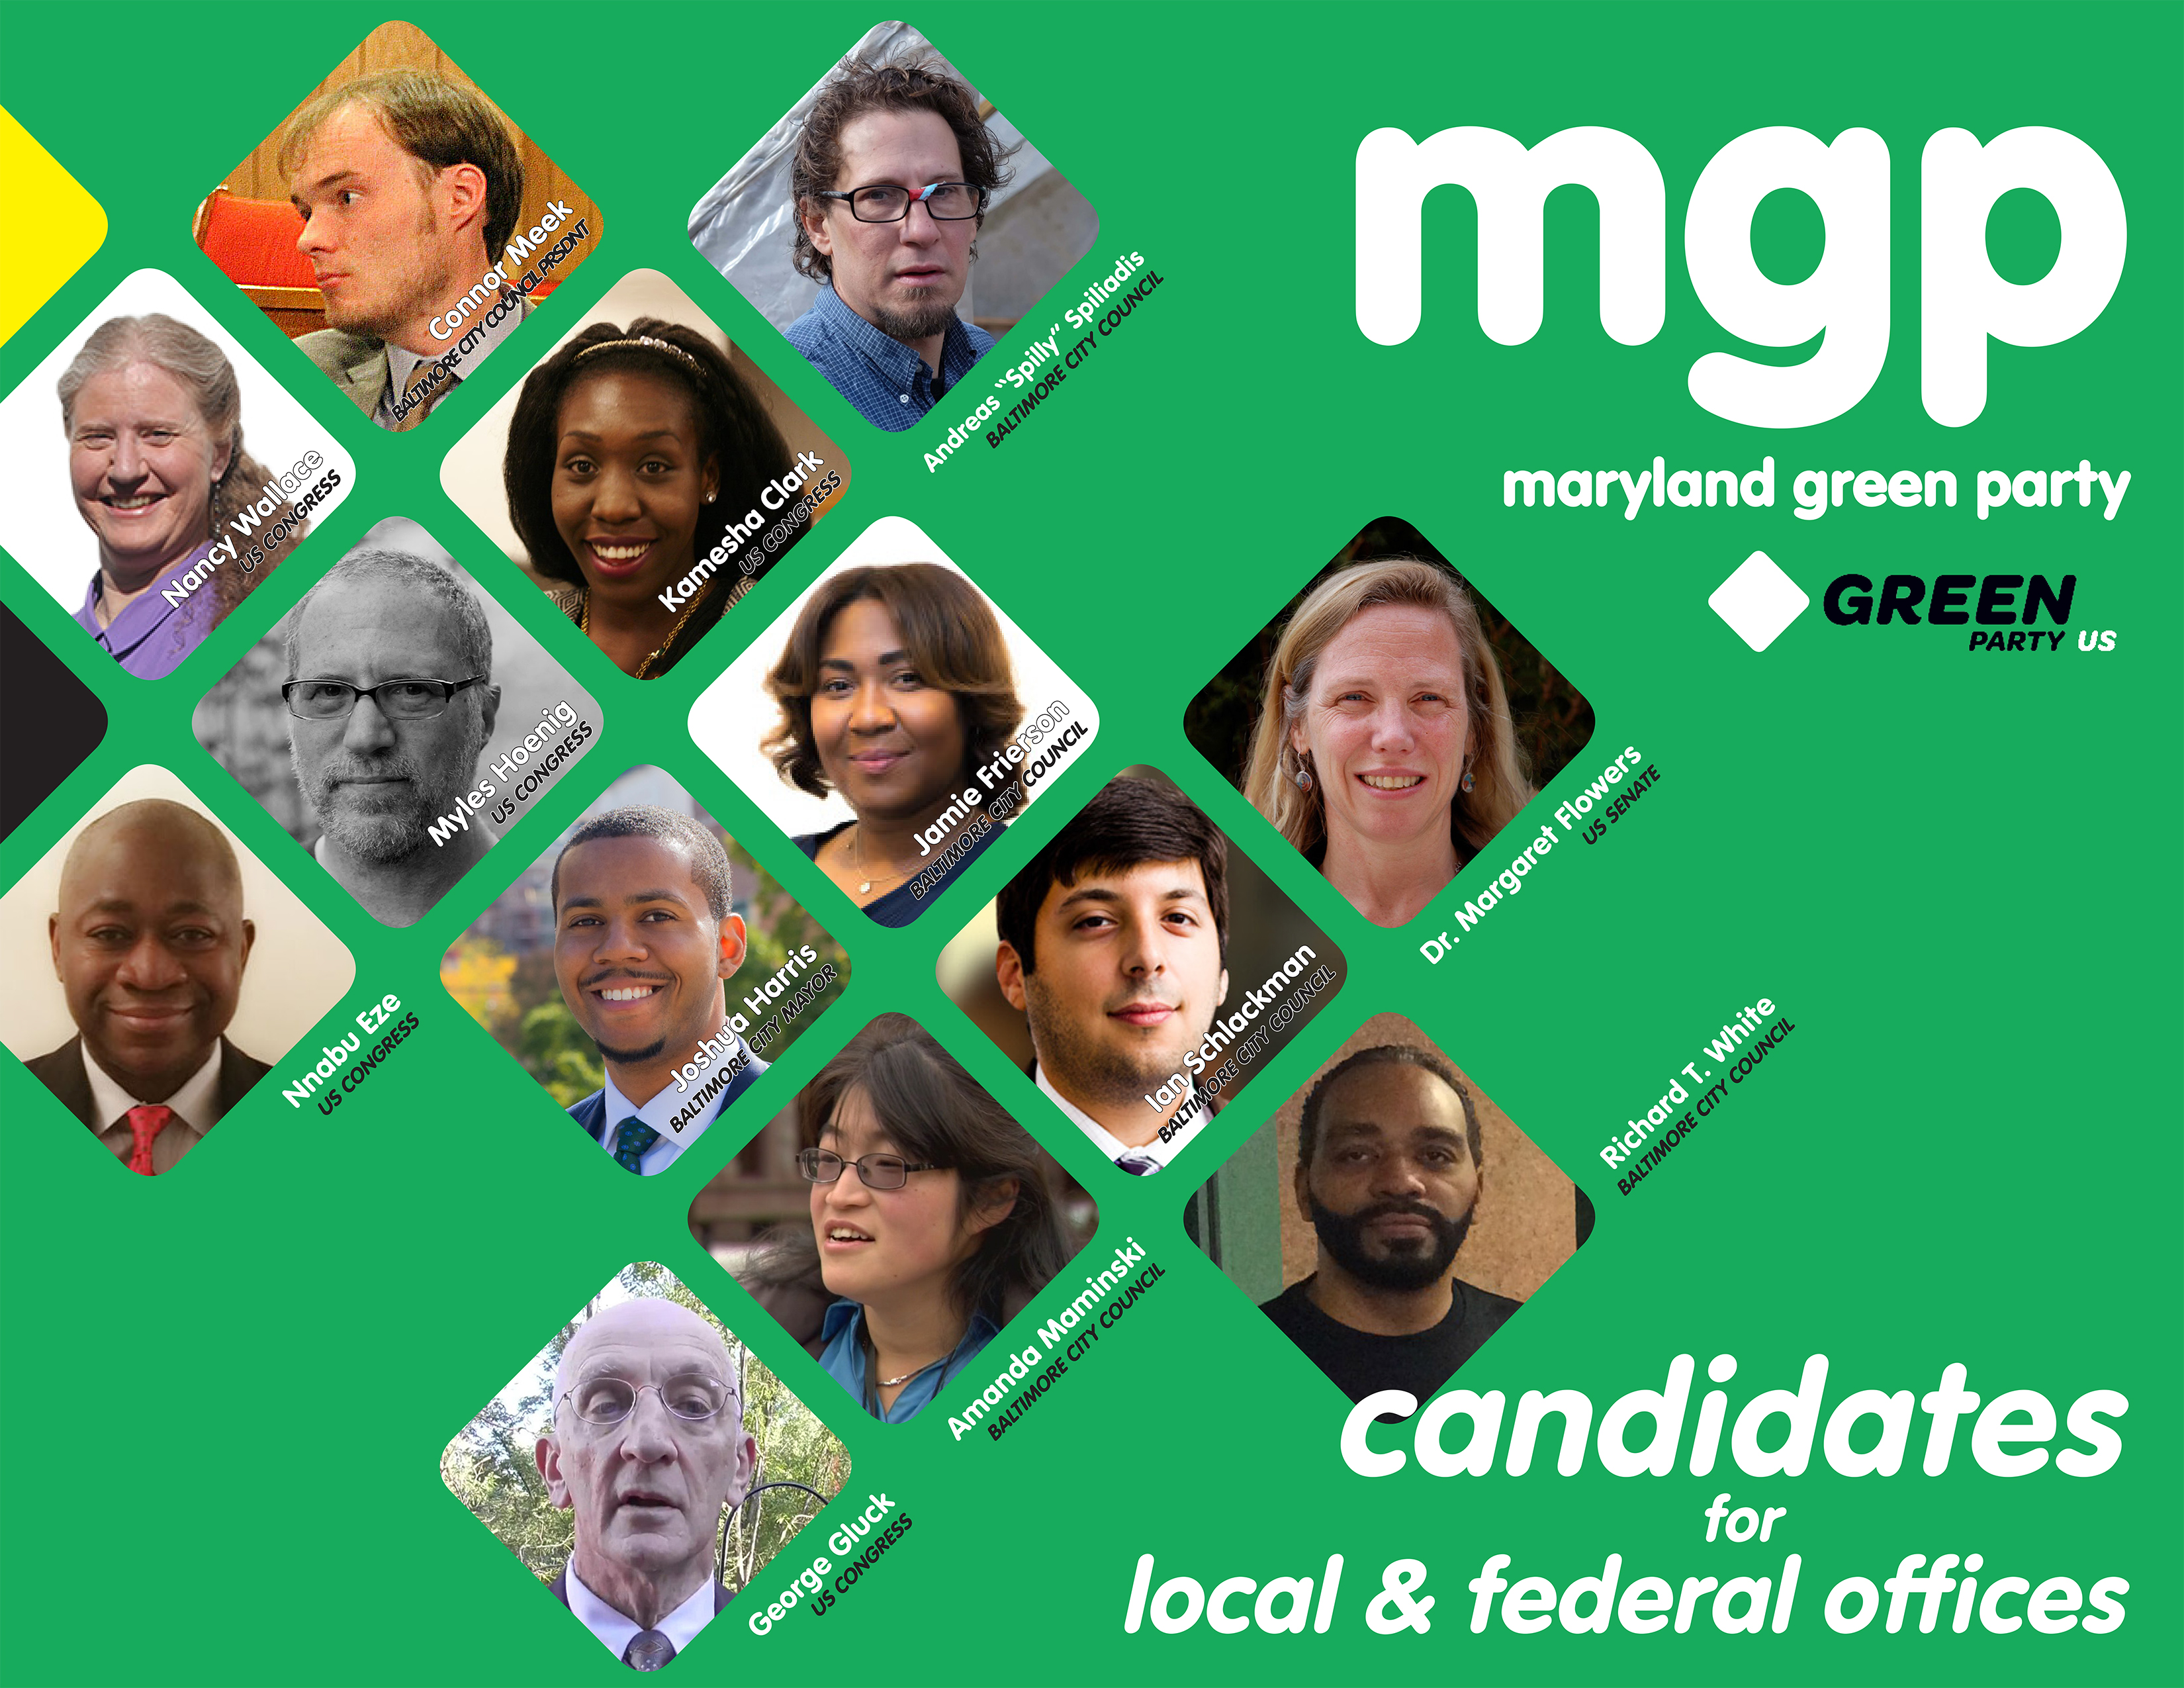 Maryland_Candidates.jpg